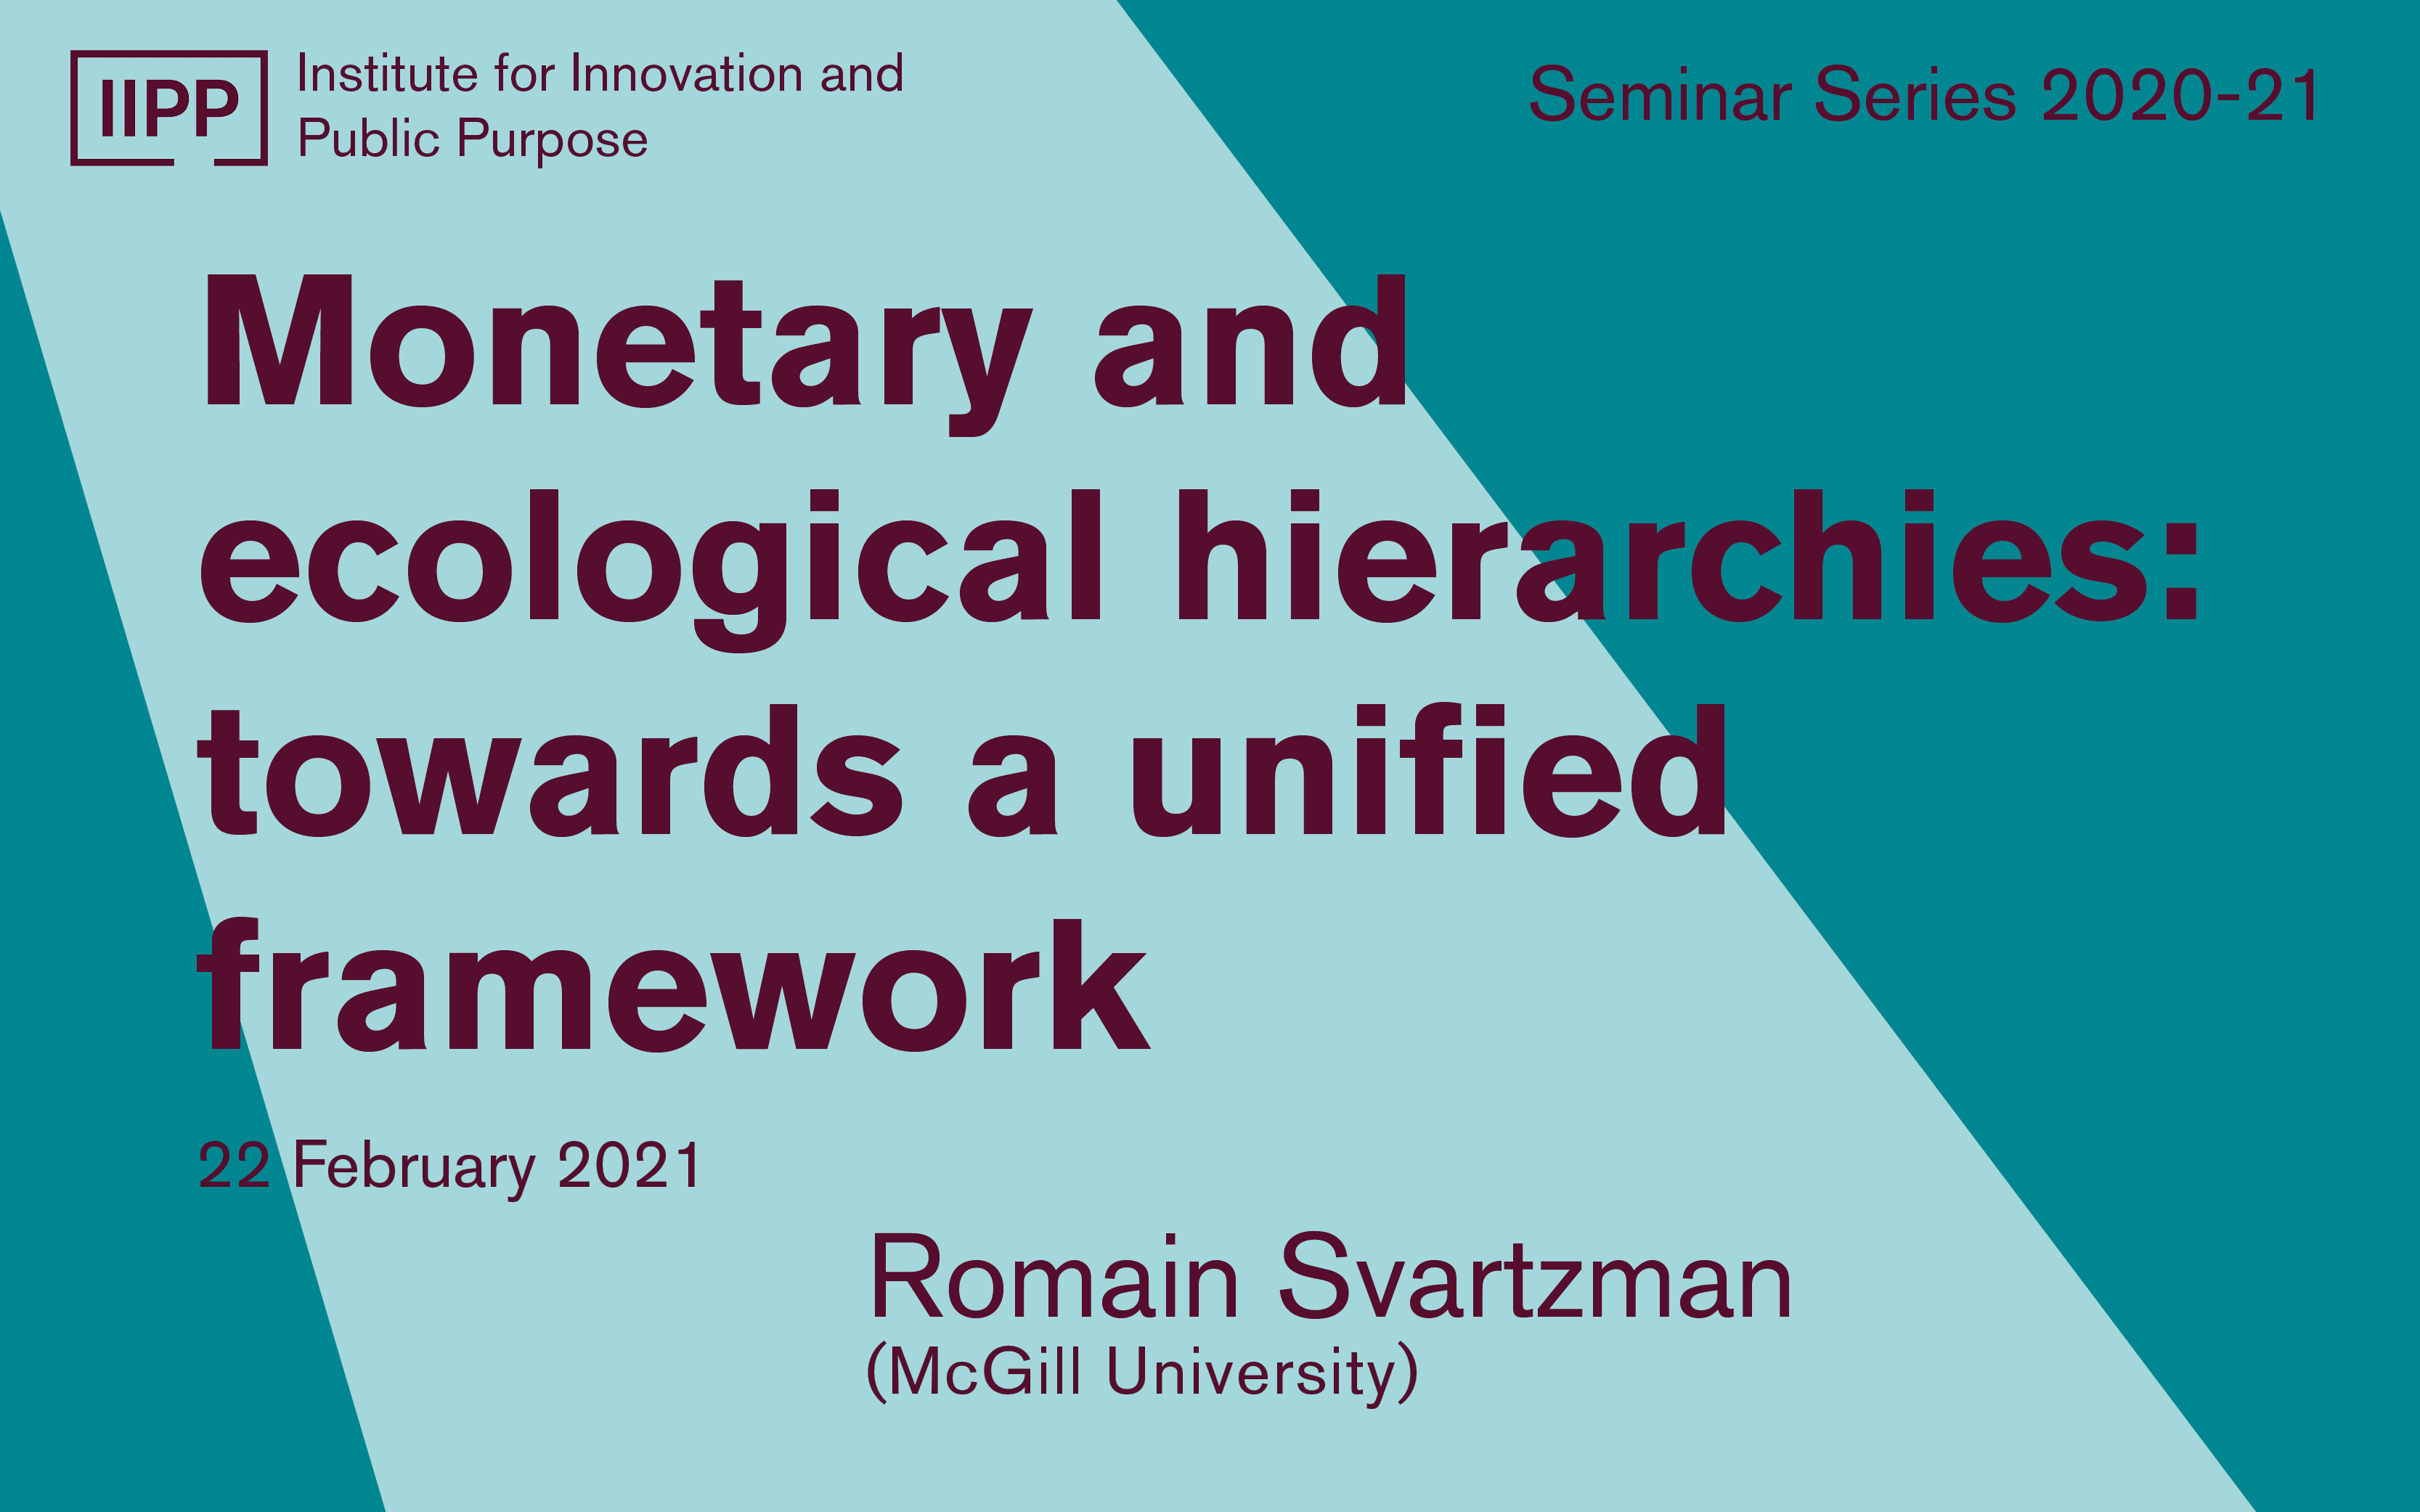 seminar_series_2020-21_romainsvartzman_website.png